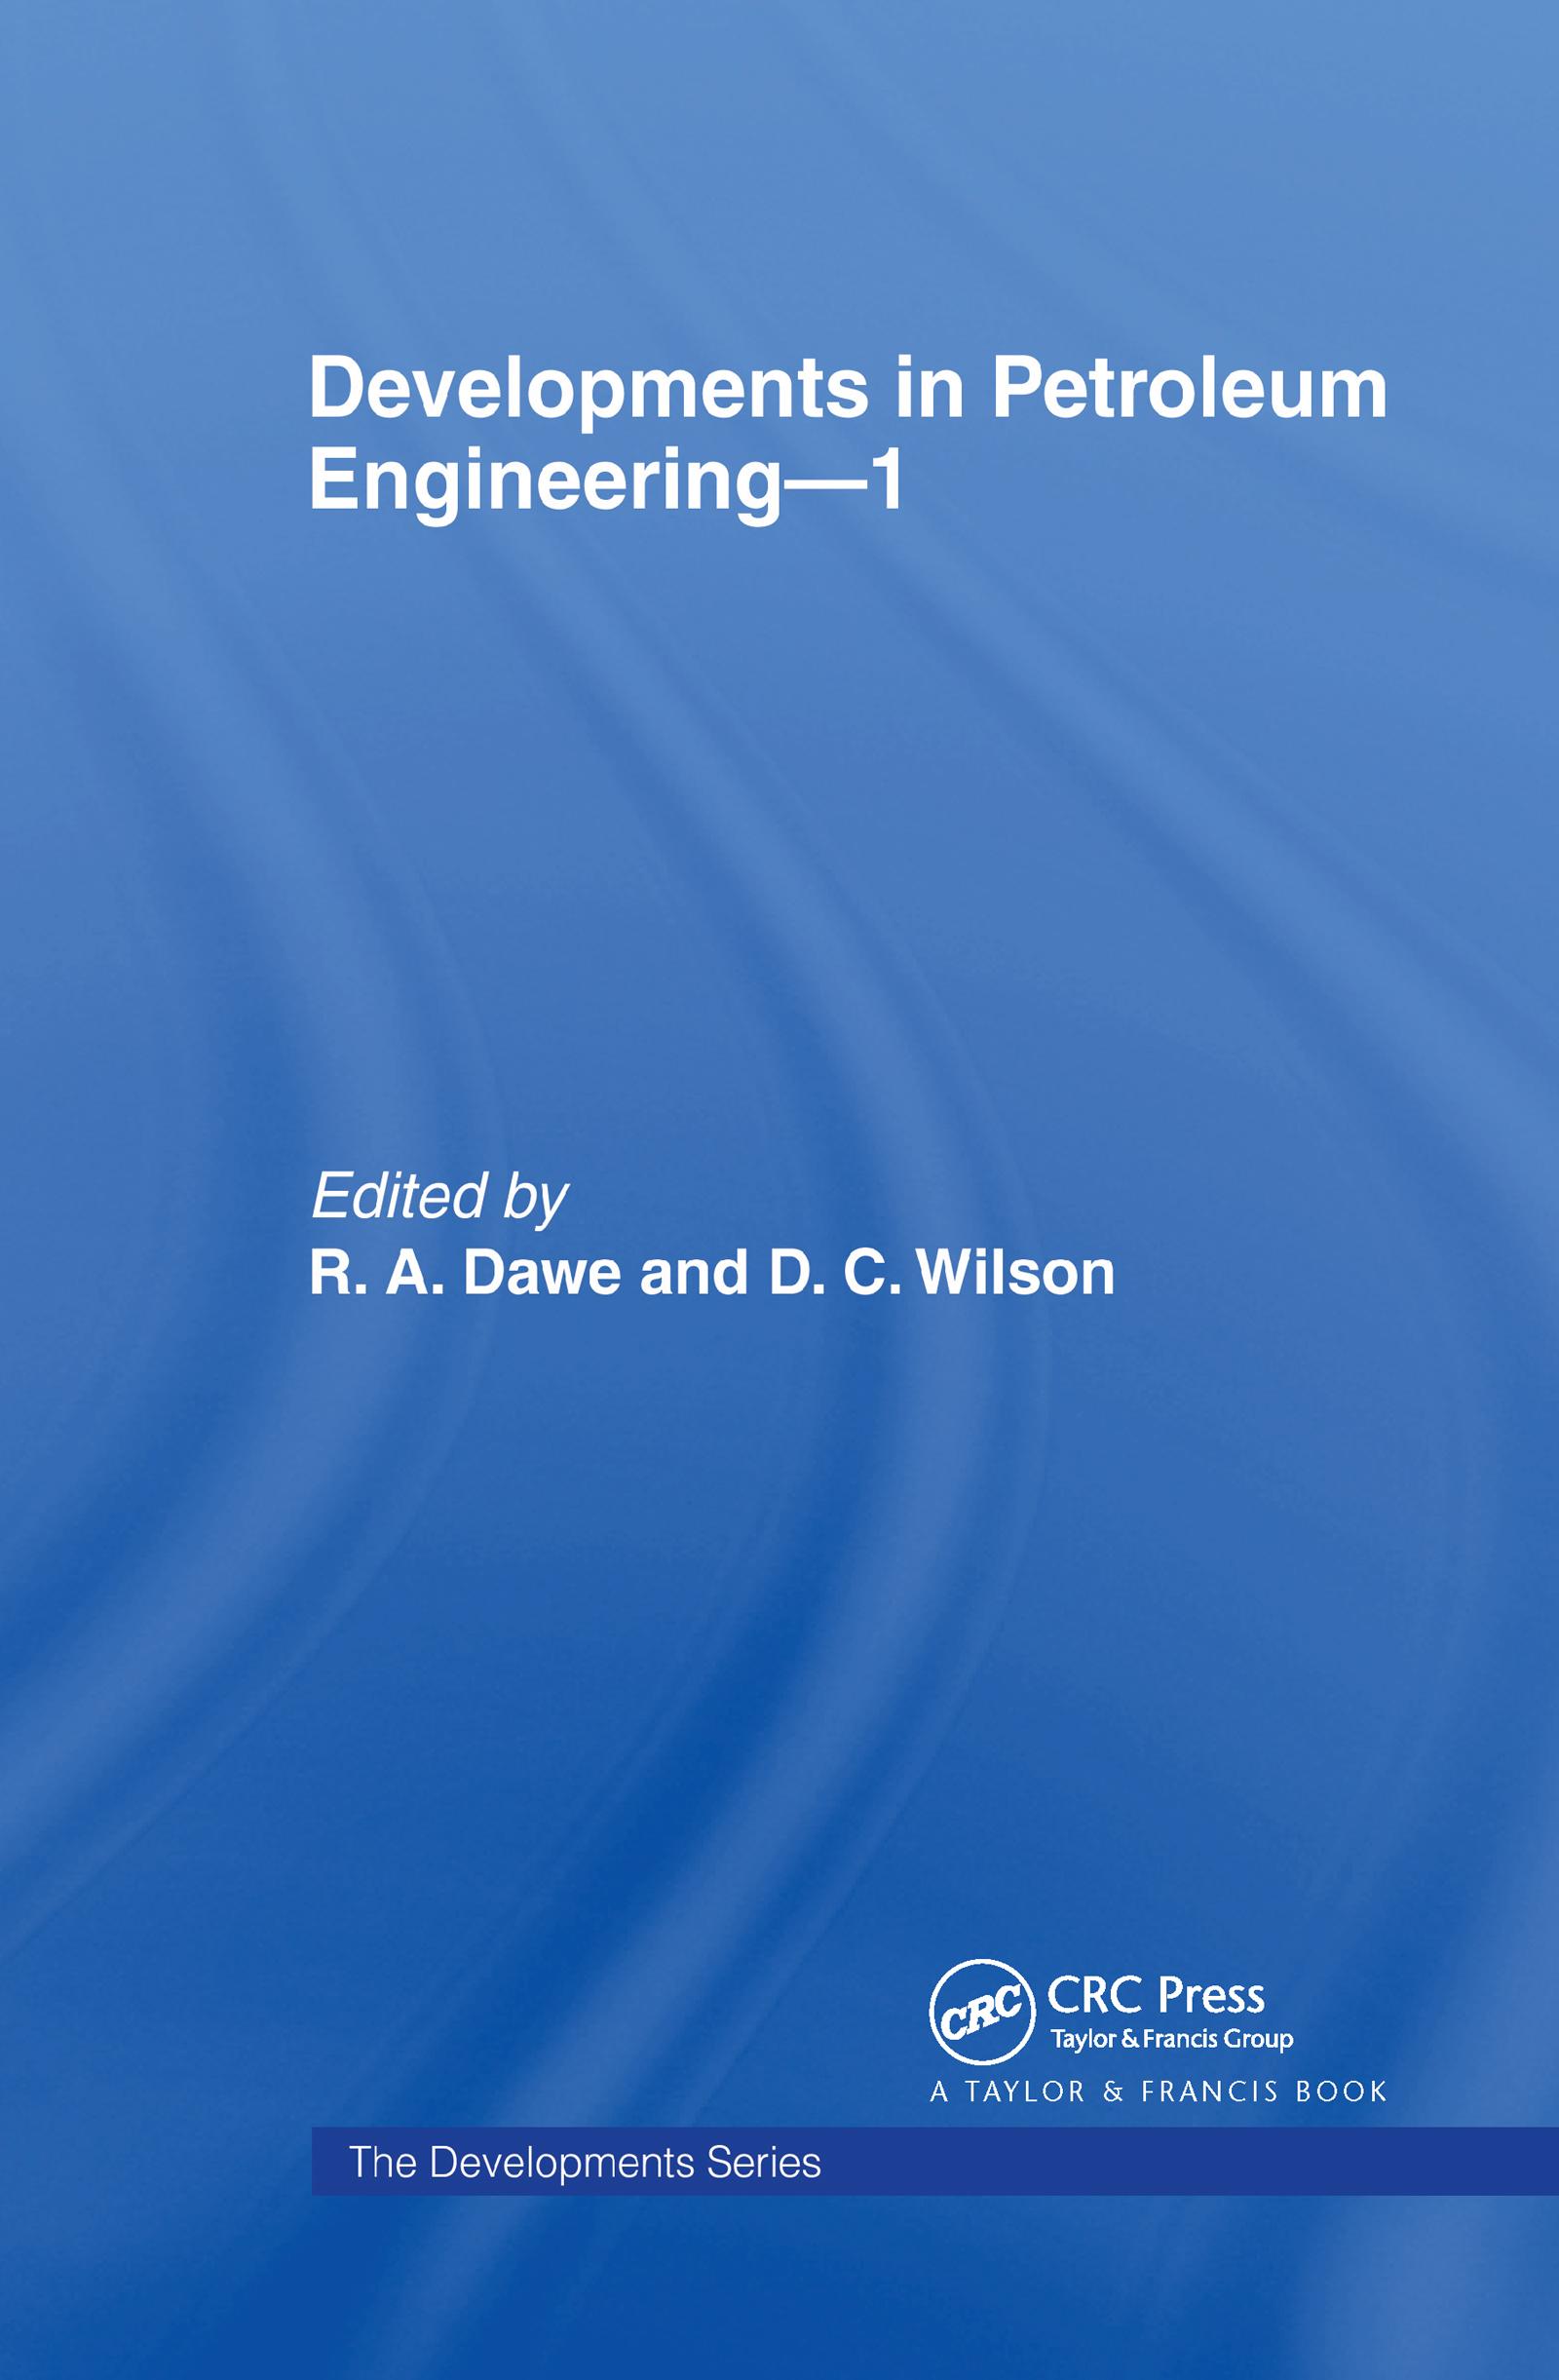 Developments in Petroleum Engineering 1: 1st Edition (Hardback) book cover